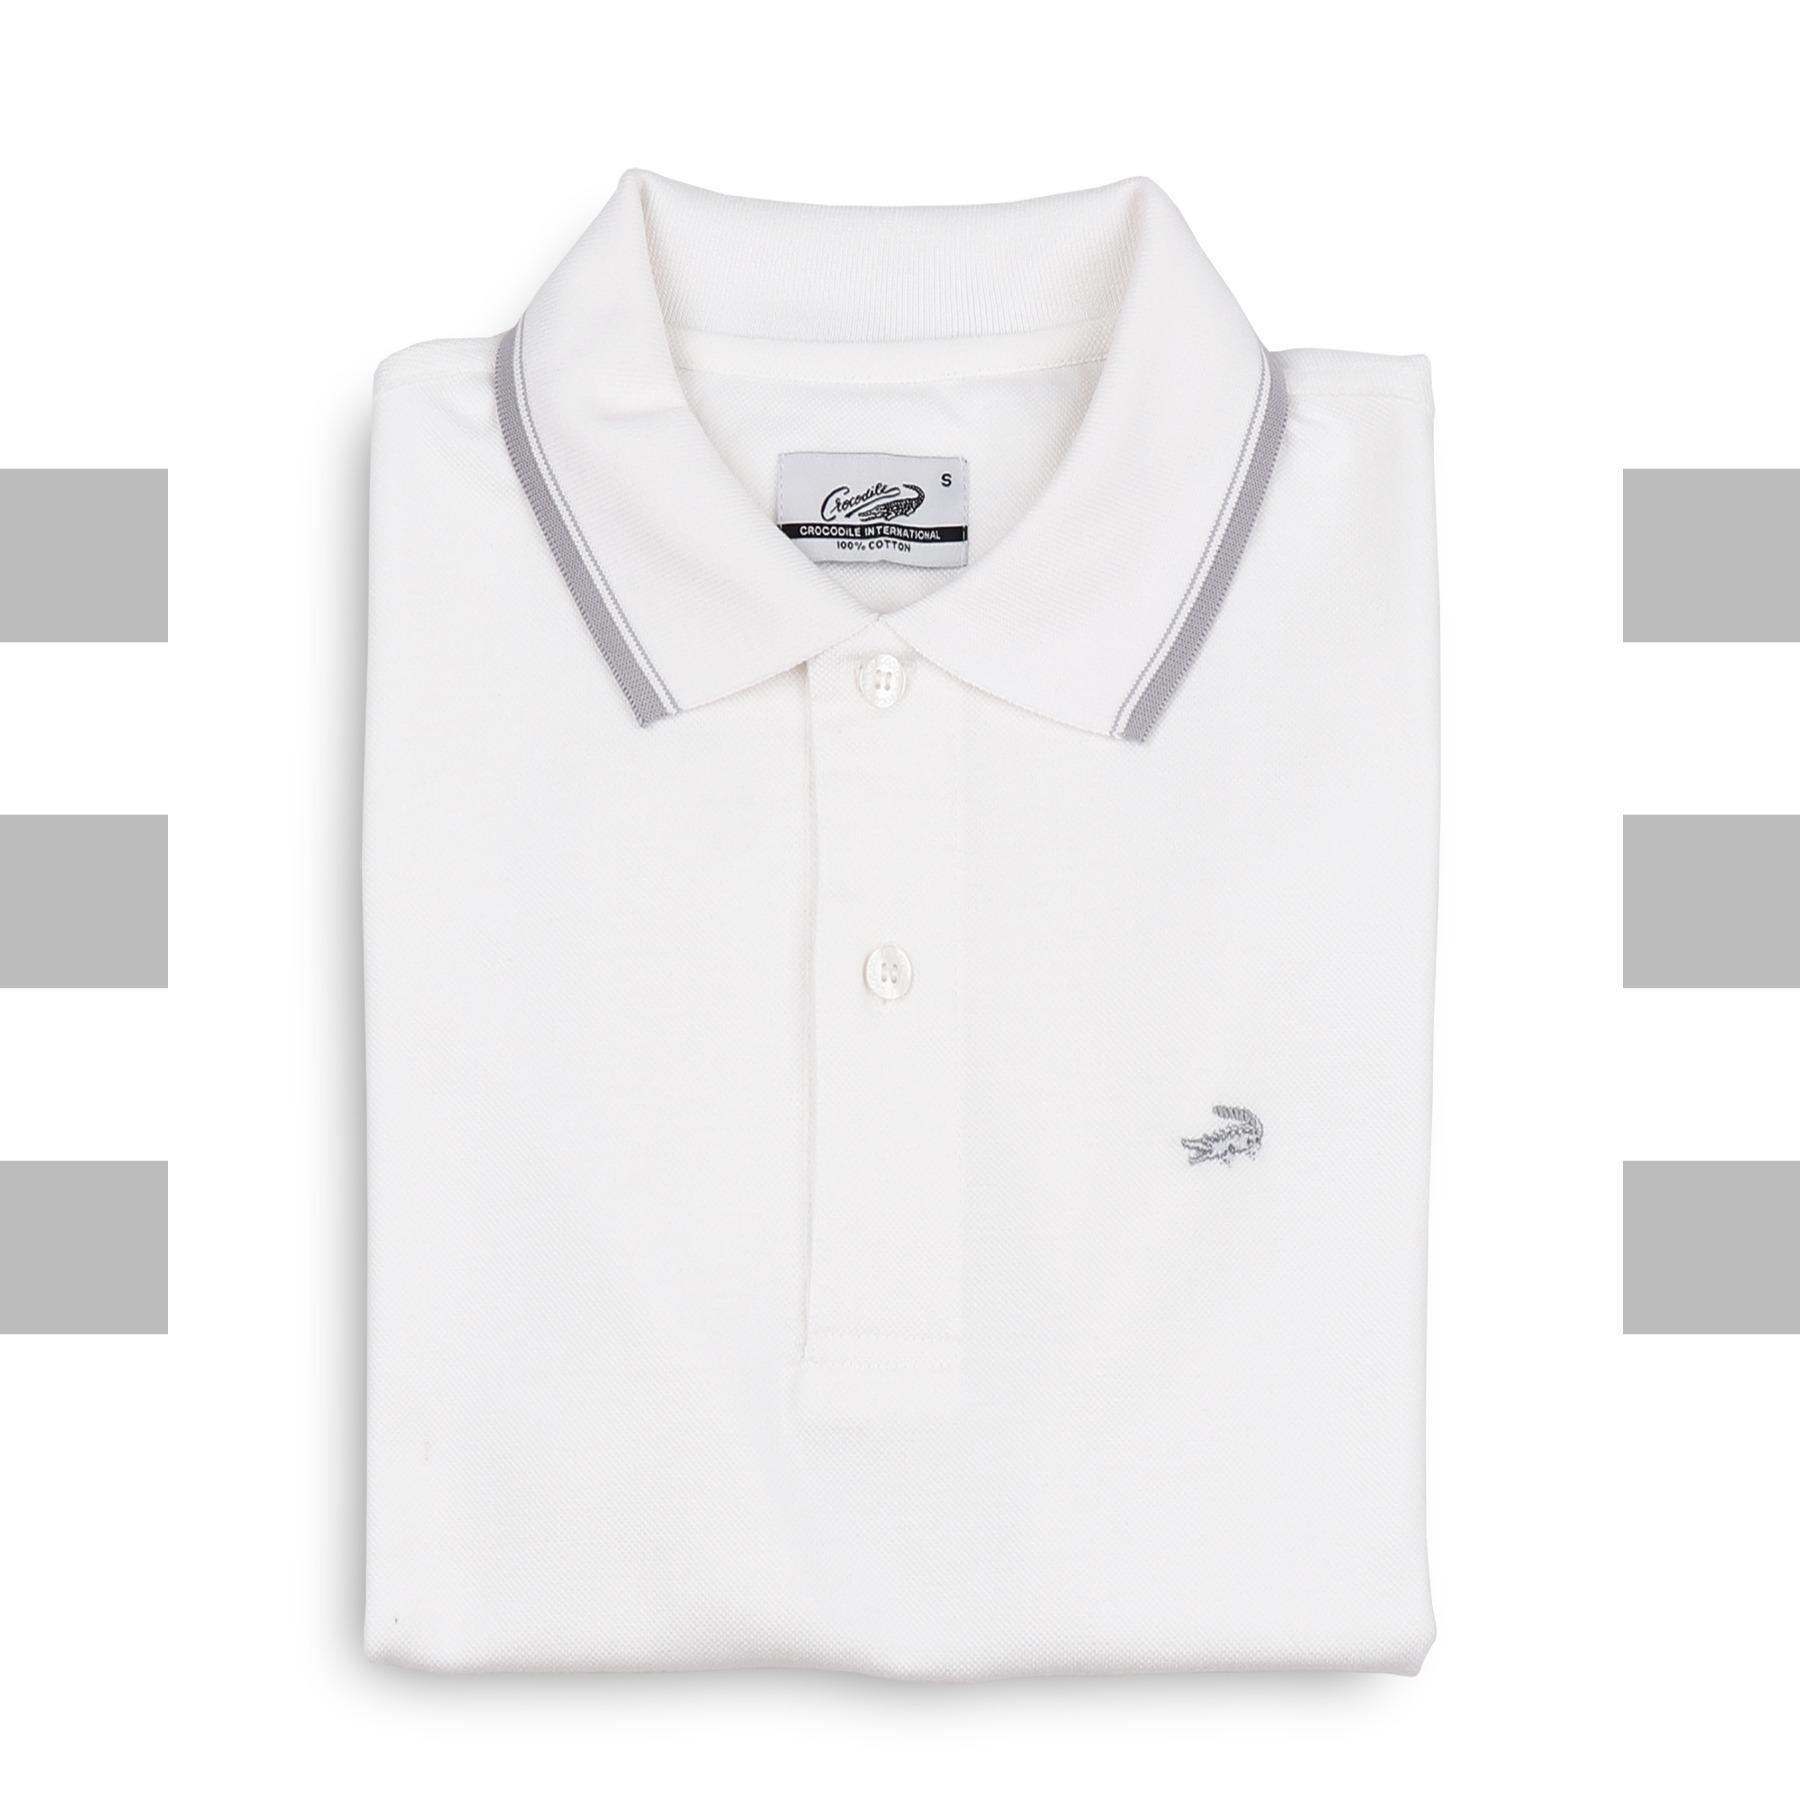 HALO Ash - Baju Pria Crocodile Men Polo Shirt - Bahan Katun 100% Cotton - KHUSUS PENJUALAN ONLINE